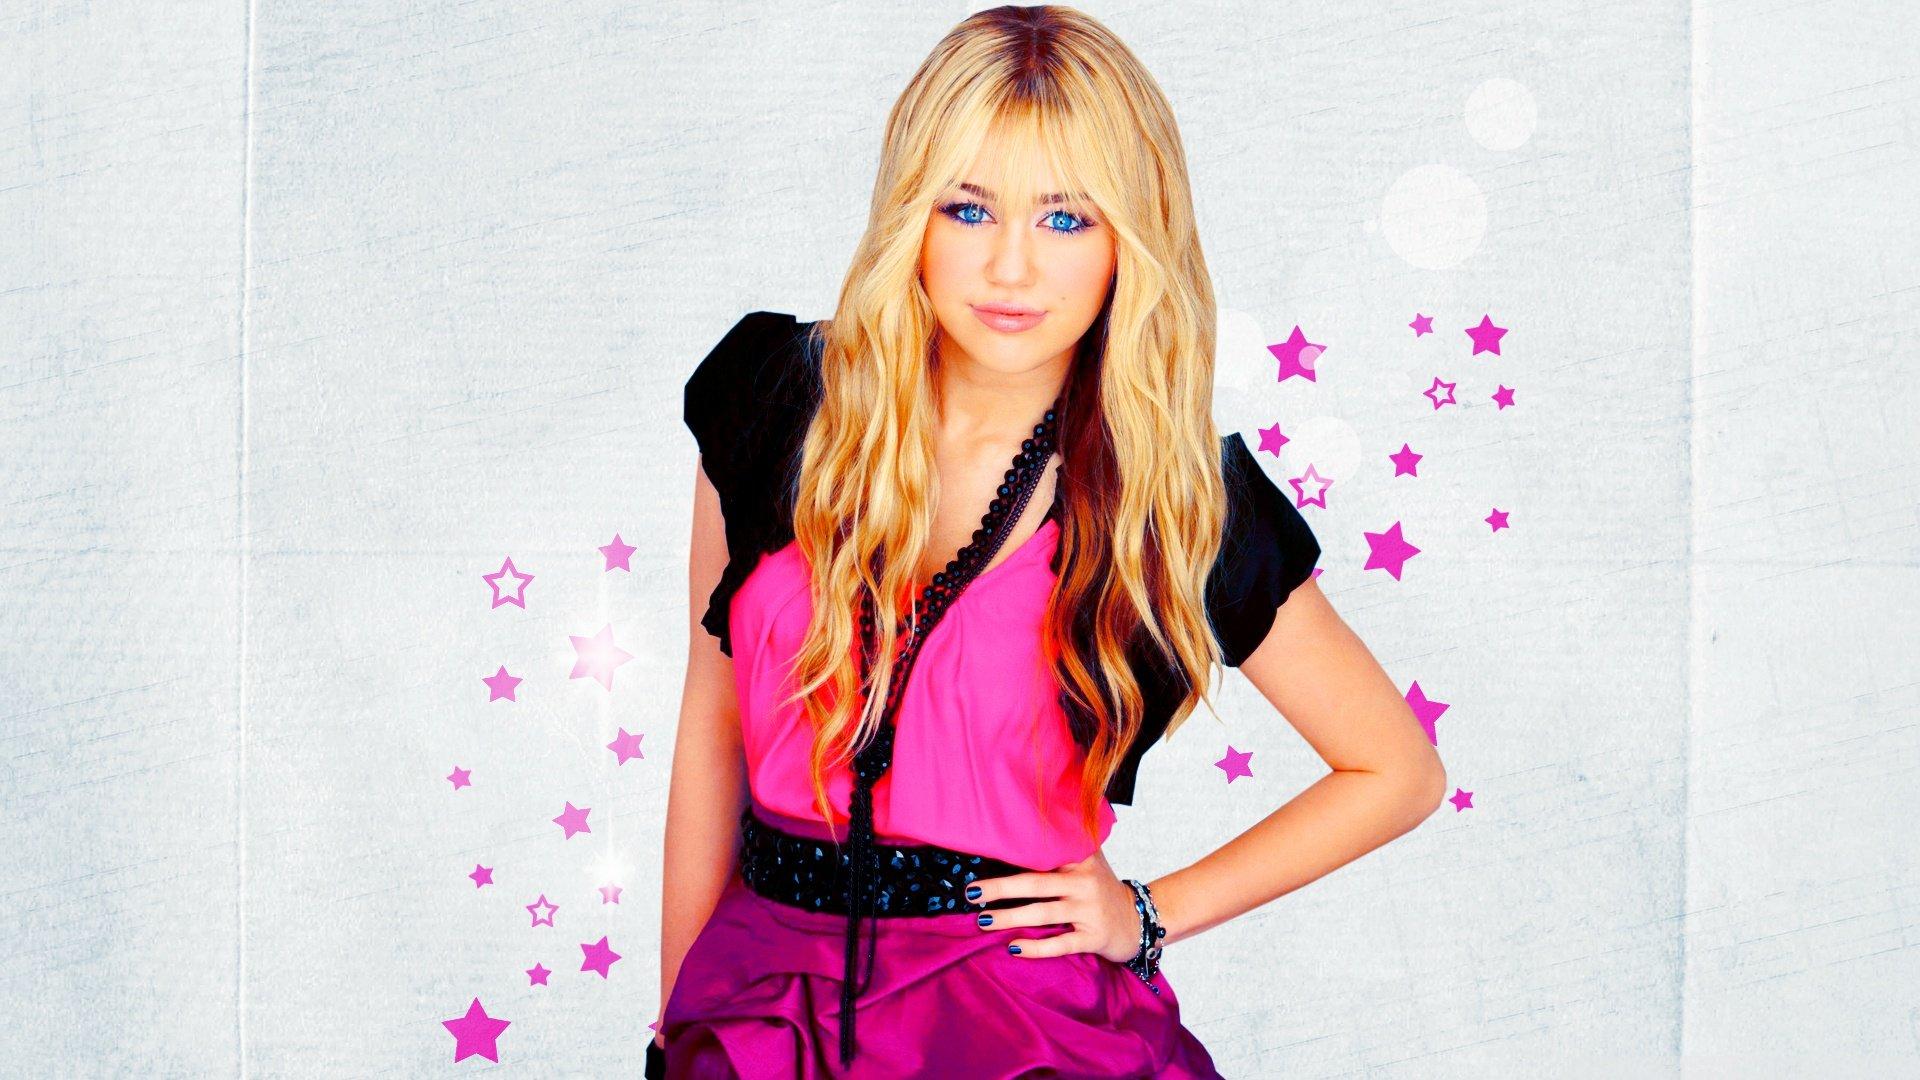 High Resolution Miley Cyrus Hd 1920x1080 Wallpaper Id81040